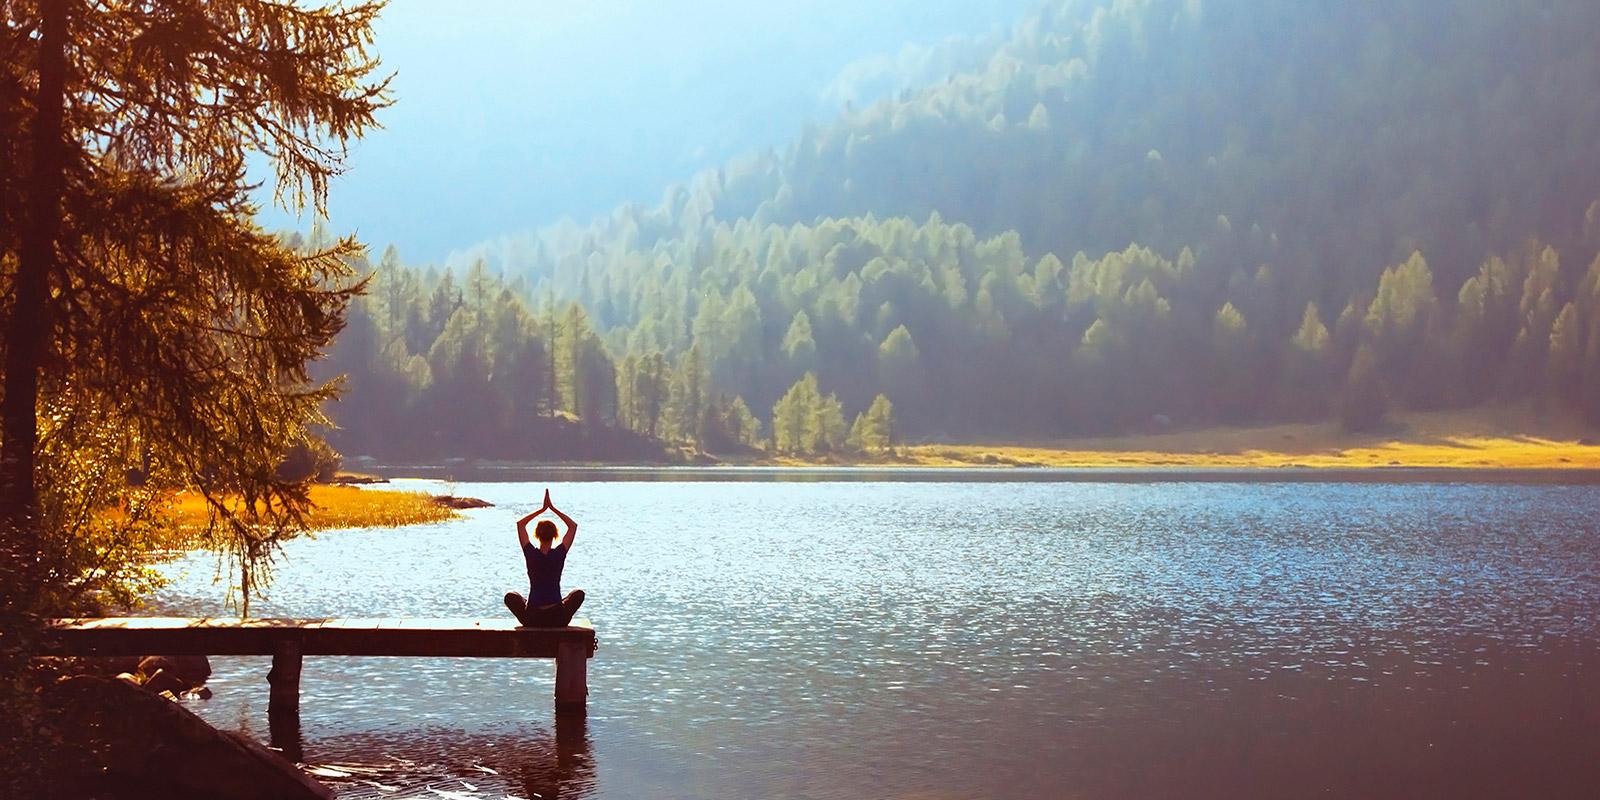 Paz interior meditaci n juan manzanera for Meditacion paz interior